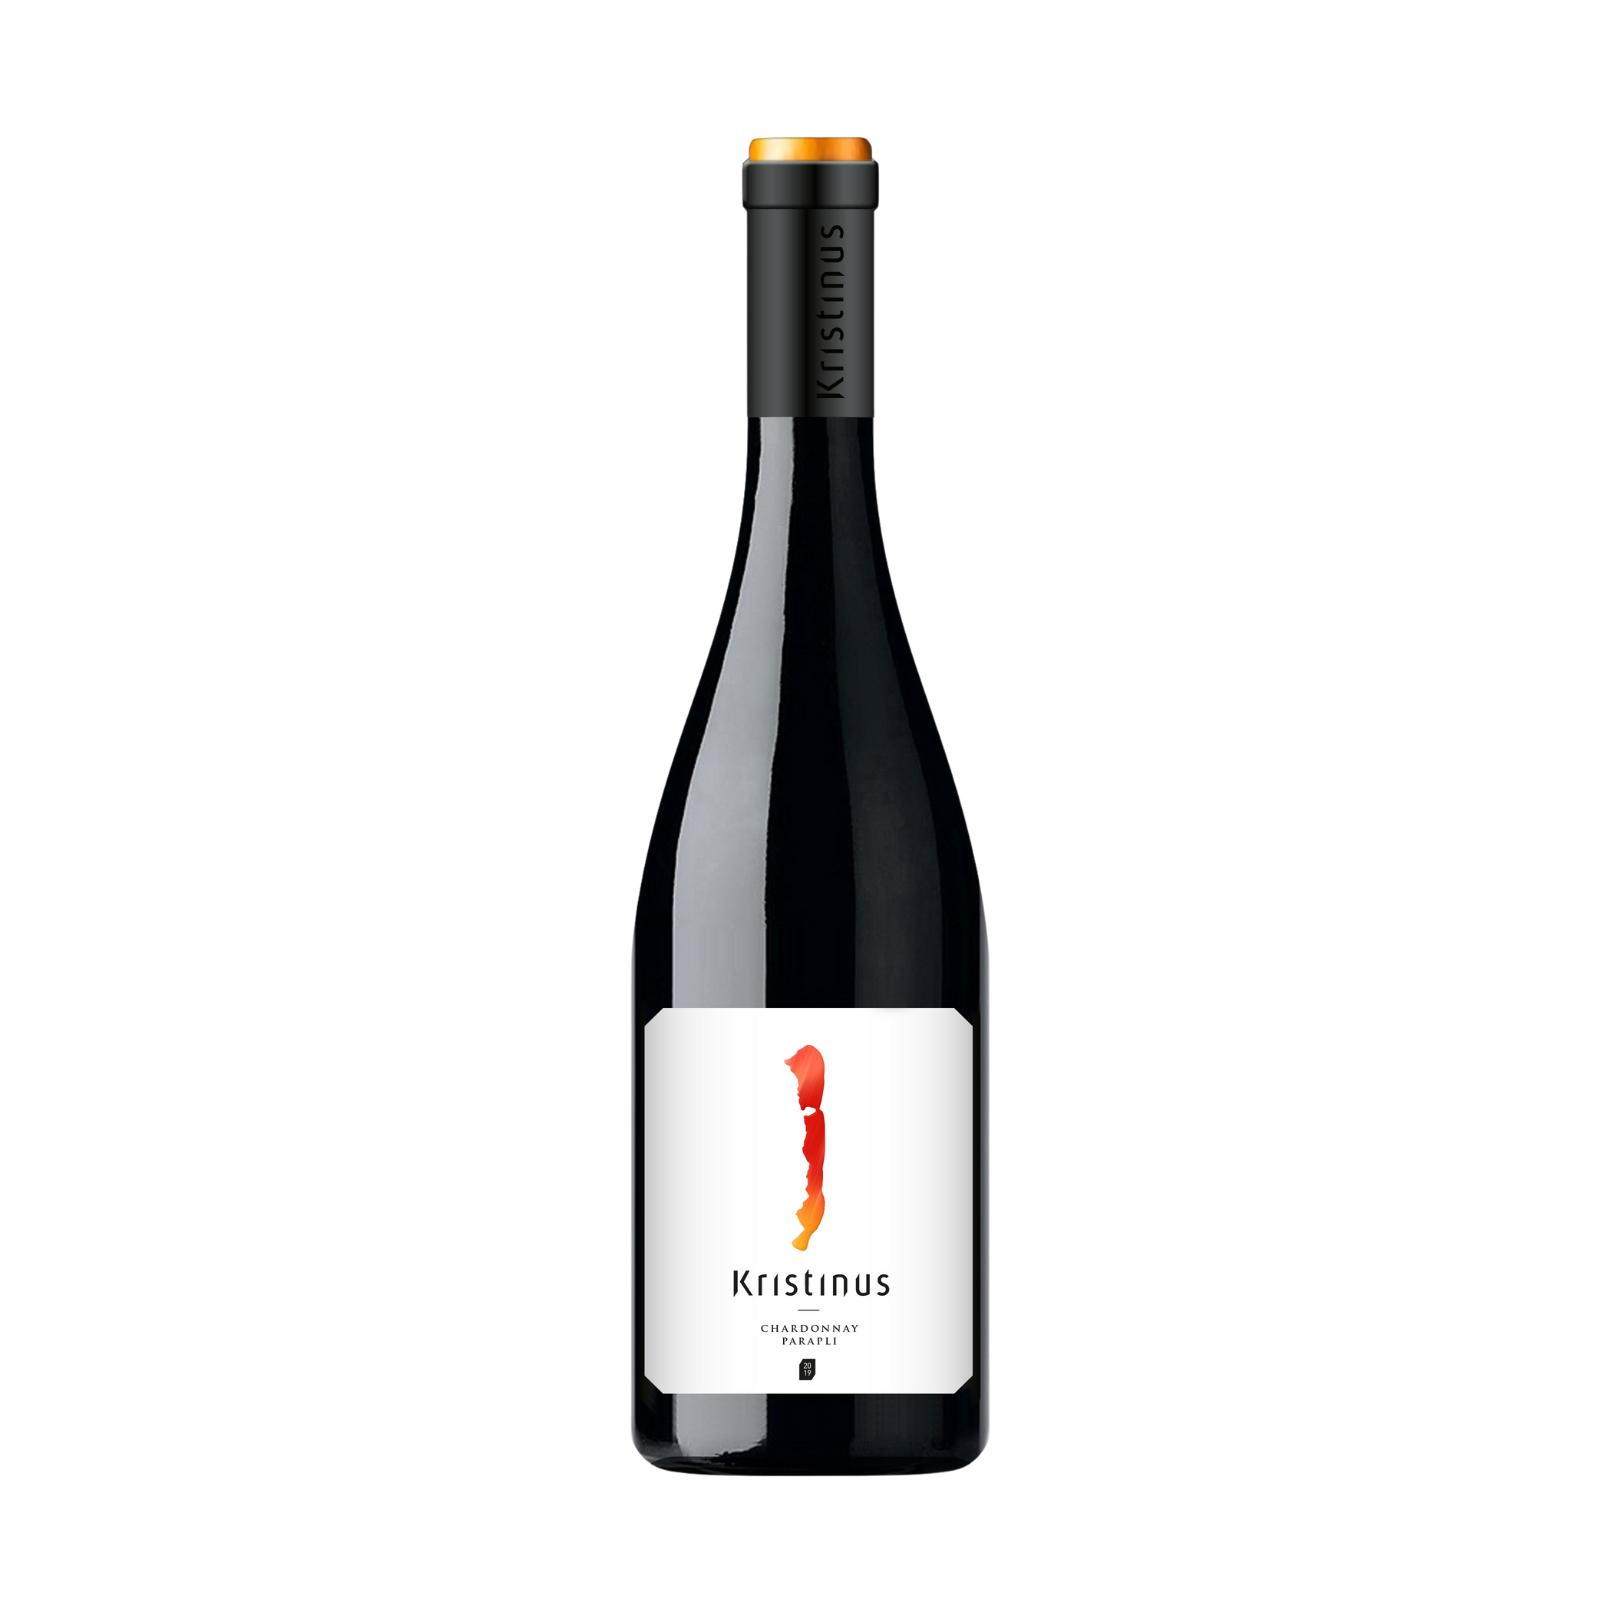 Kristinus Parapli Chardonnay 2019